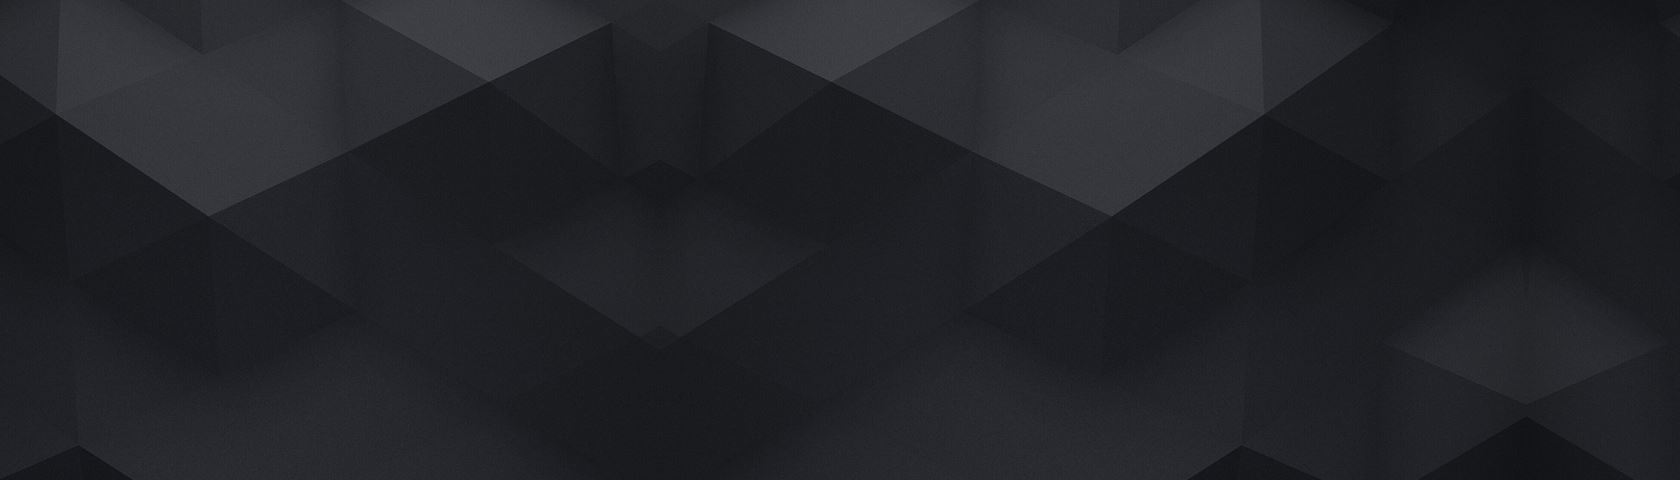 Black Nexus